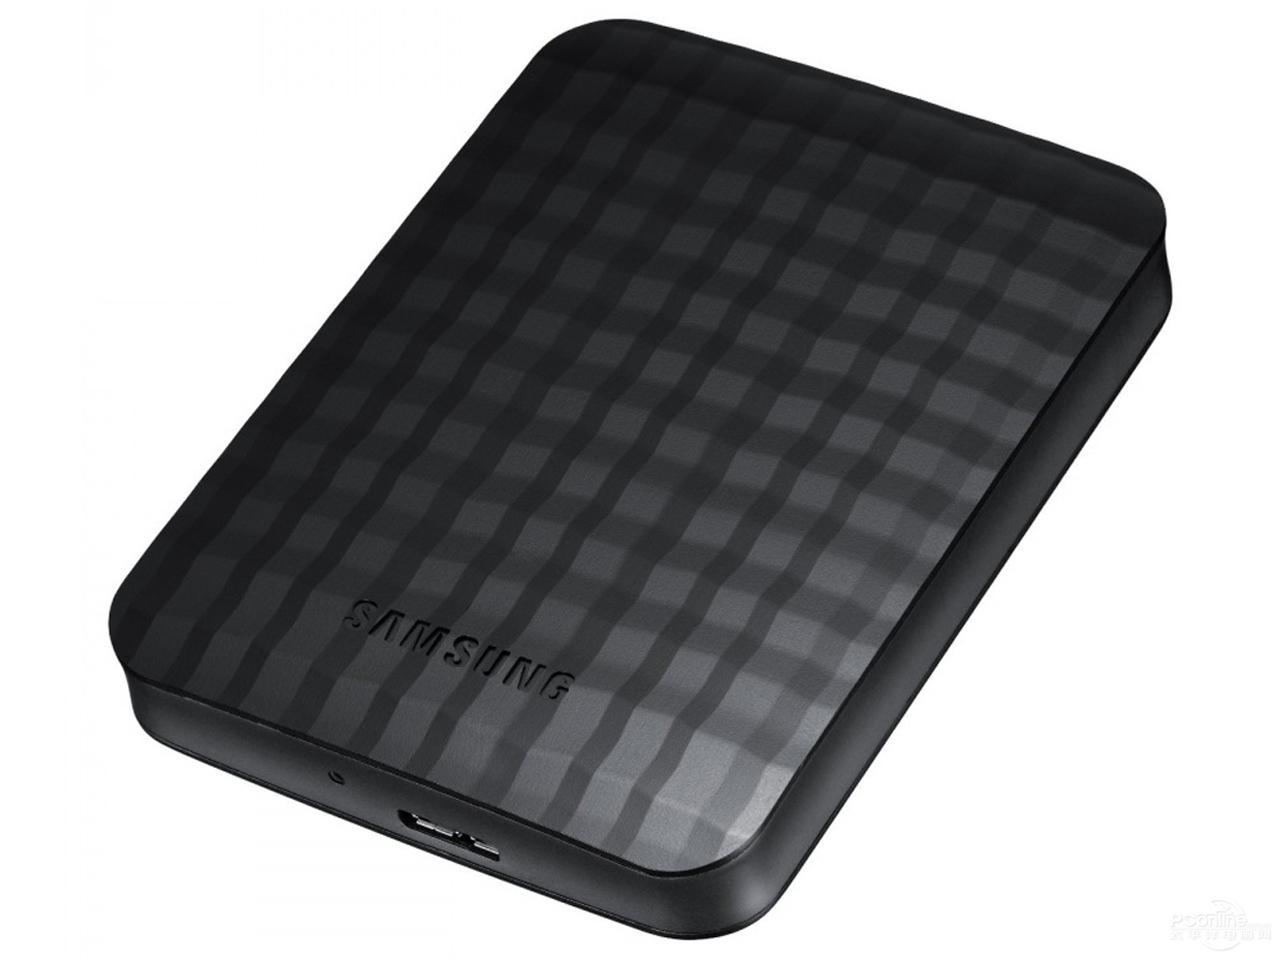 Disque dur externe Samsung USB 3.0